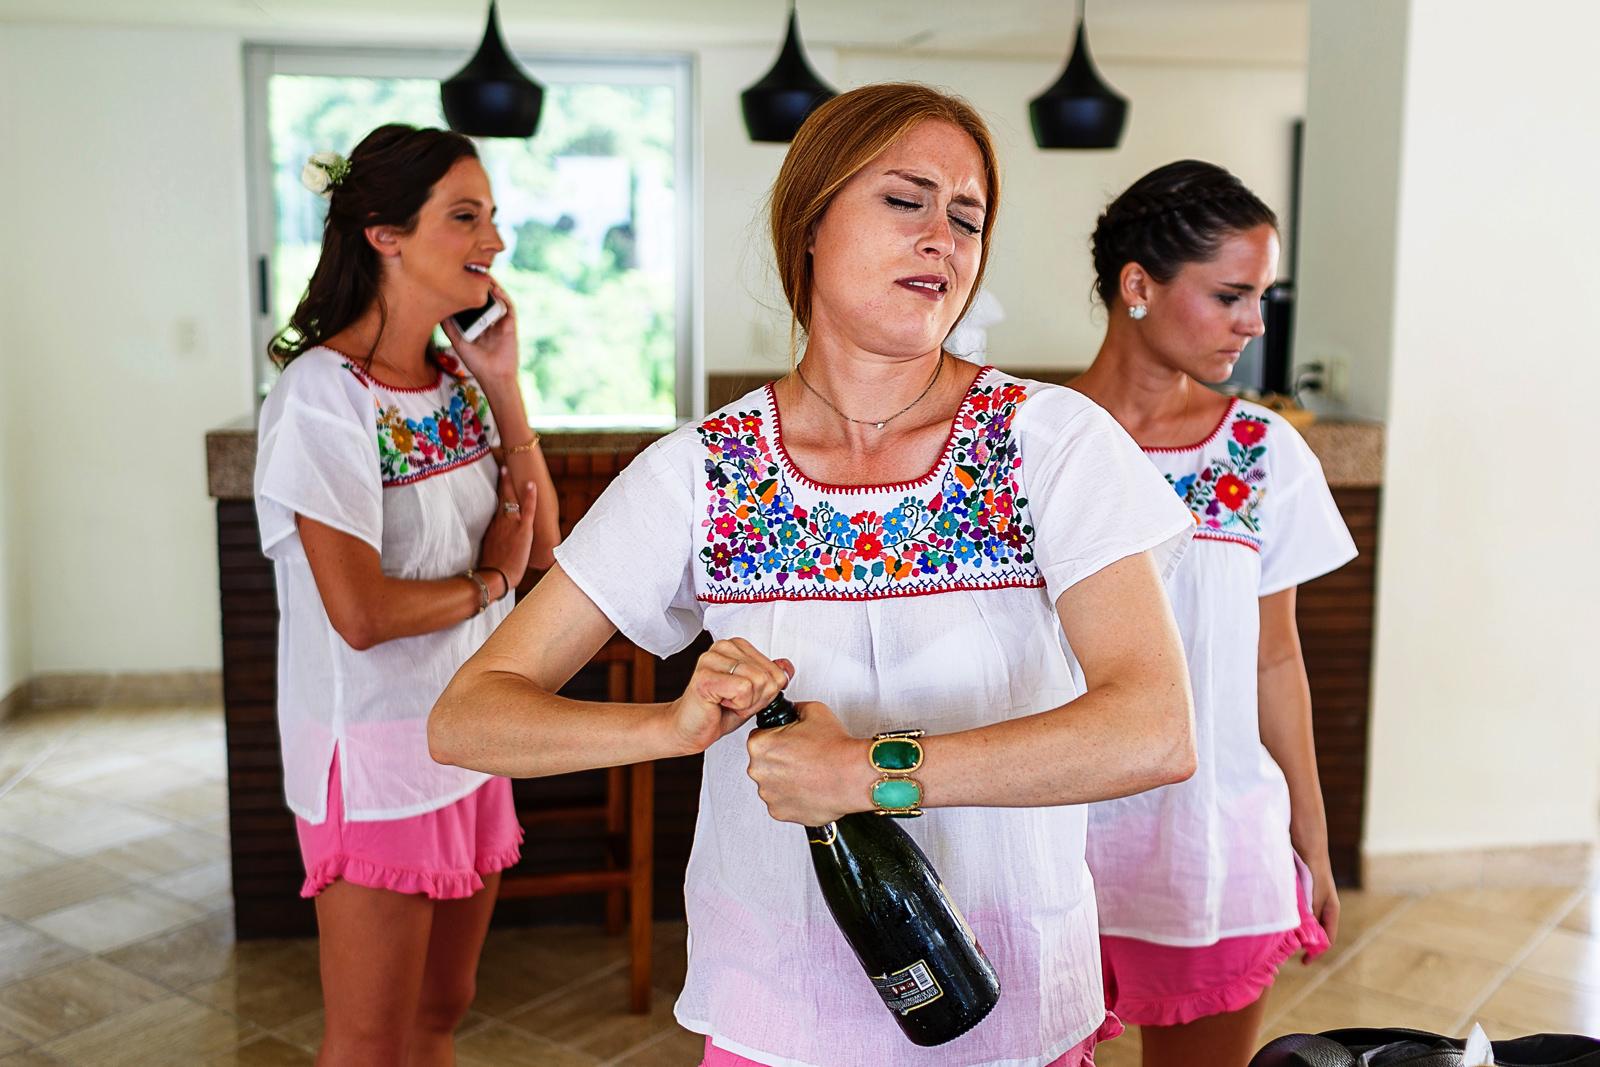 bridemaid opening the champagne - Eder Acevedo cancun los cabos vallarta wedding photographer